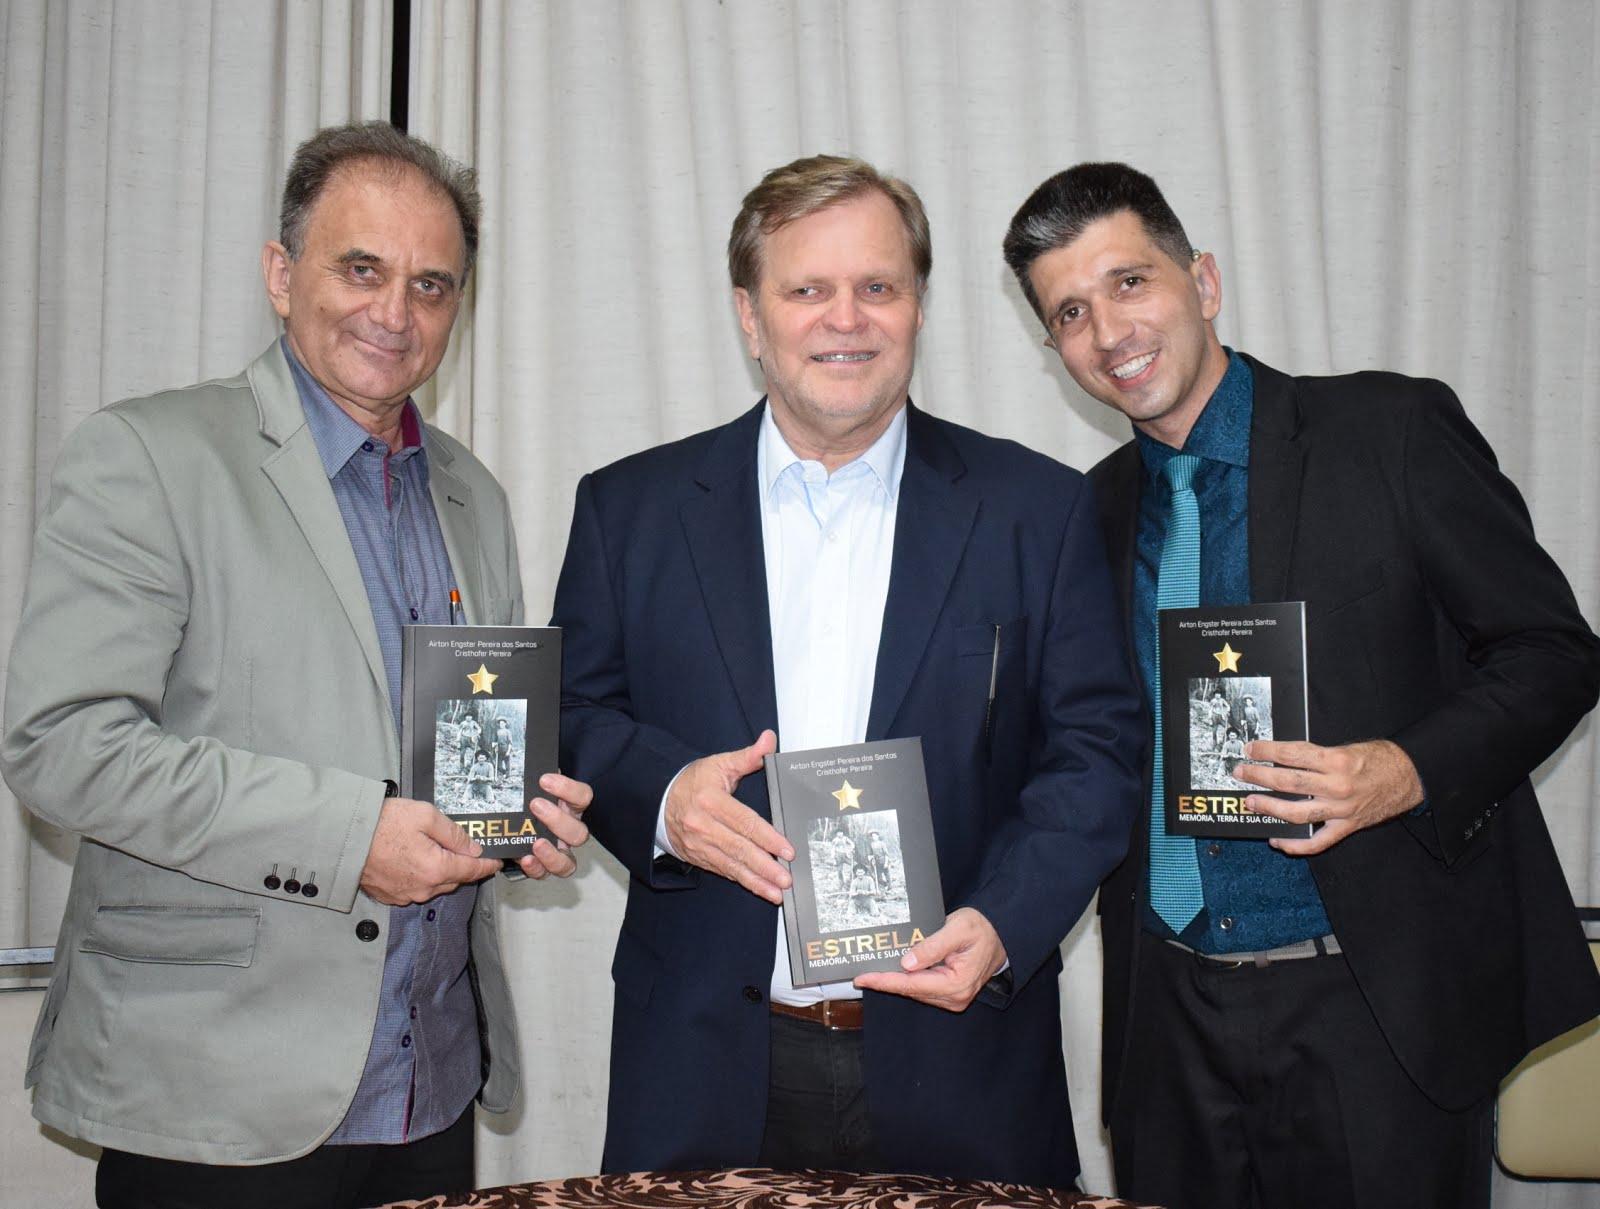 Airton Engster dos Santos, Ricardo Wagner e Cristhofer Pereira